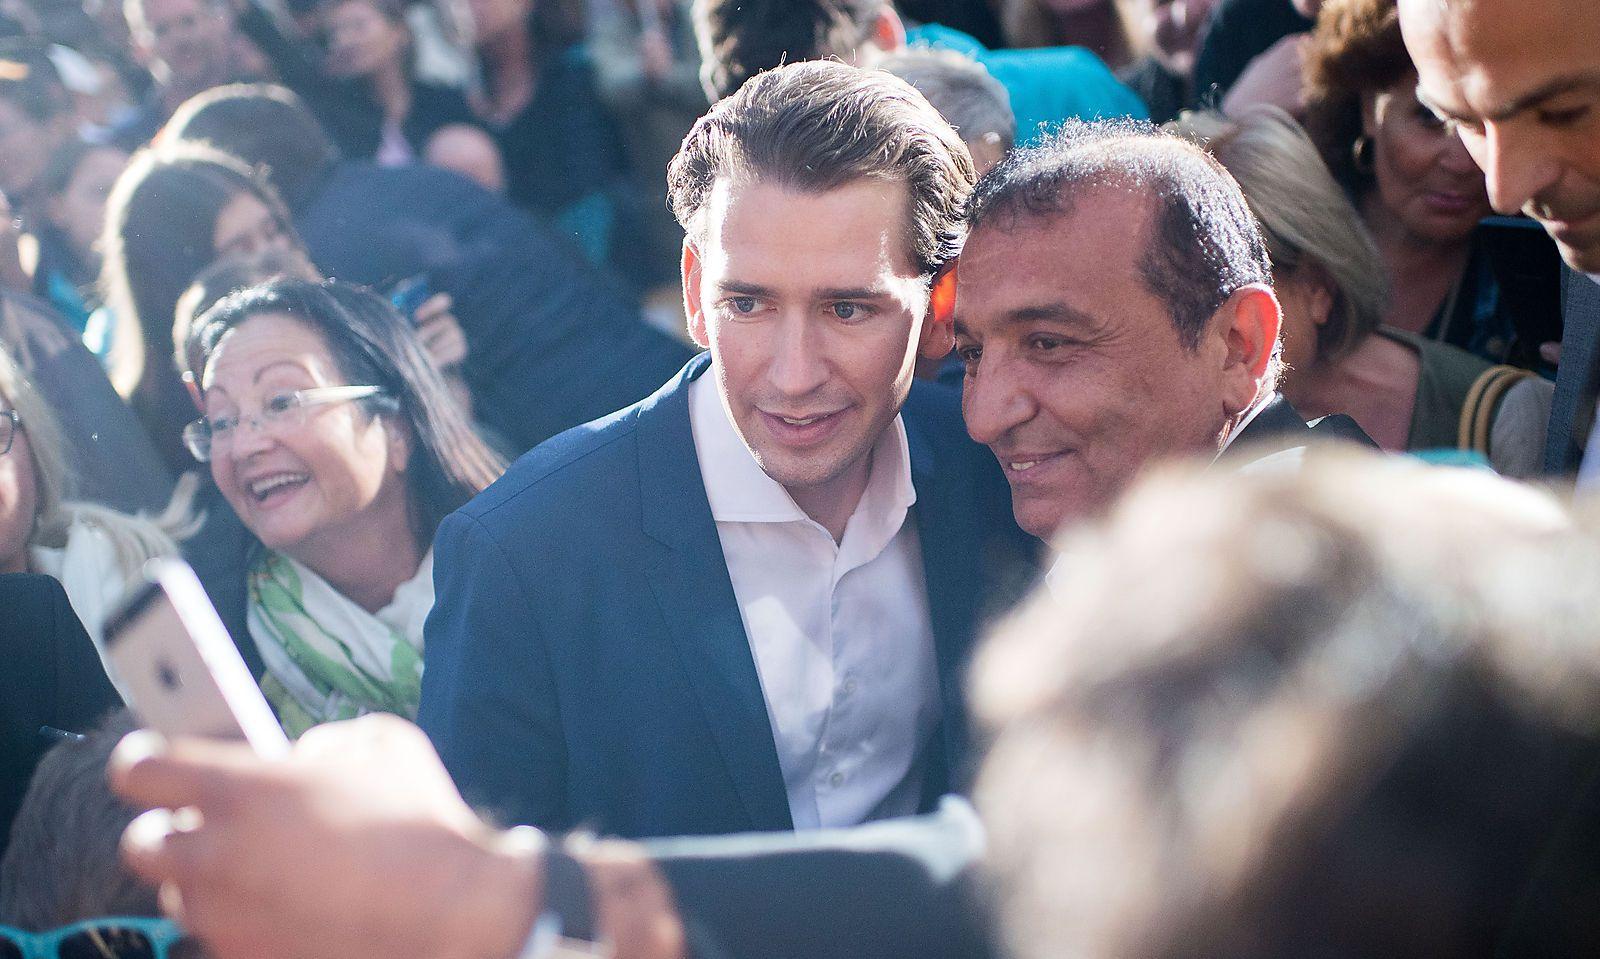 /images/uploads/7/9/3/5695379/Sebastian-Kurz-Campaigns-In-Austrian-Parliamentary-Elections_1569403238462208_v0_h.jpg